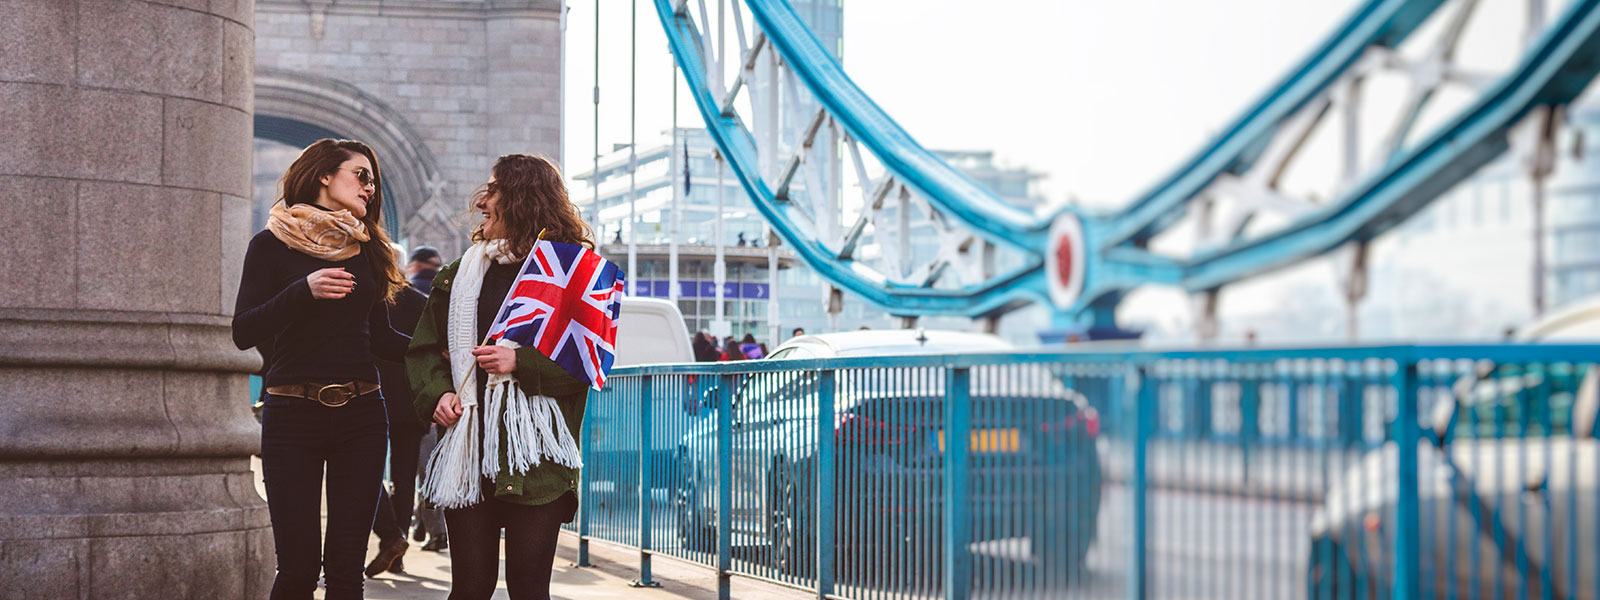 Two people walking holding UK flag